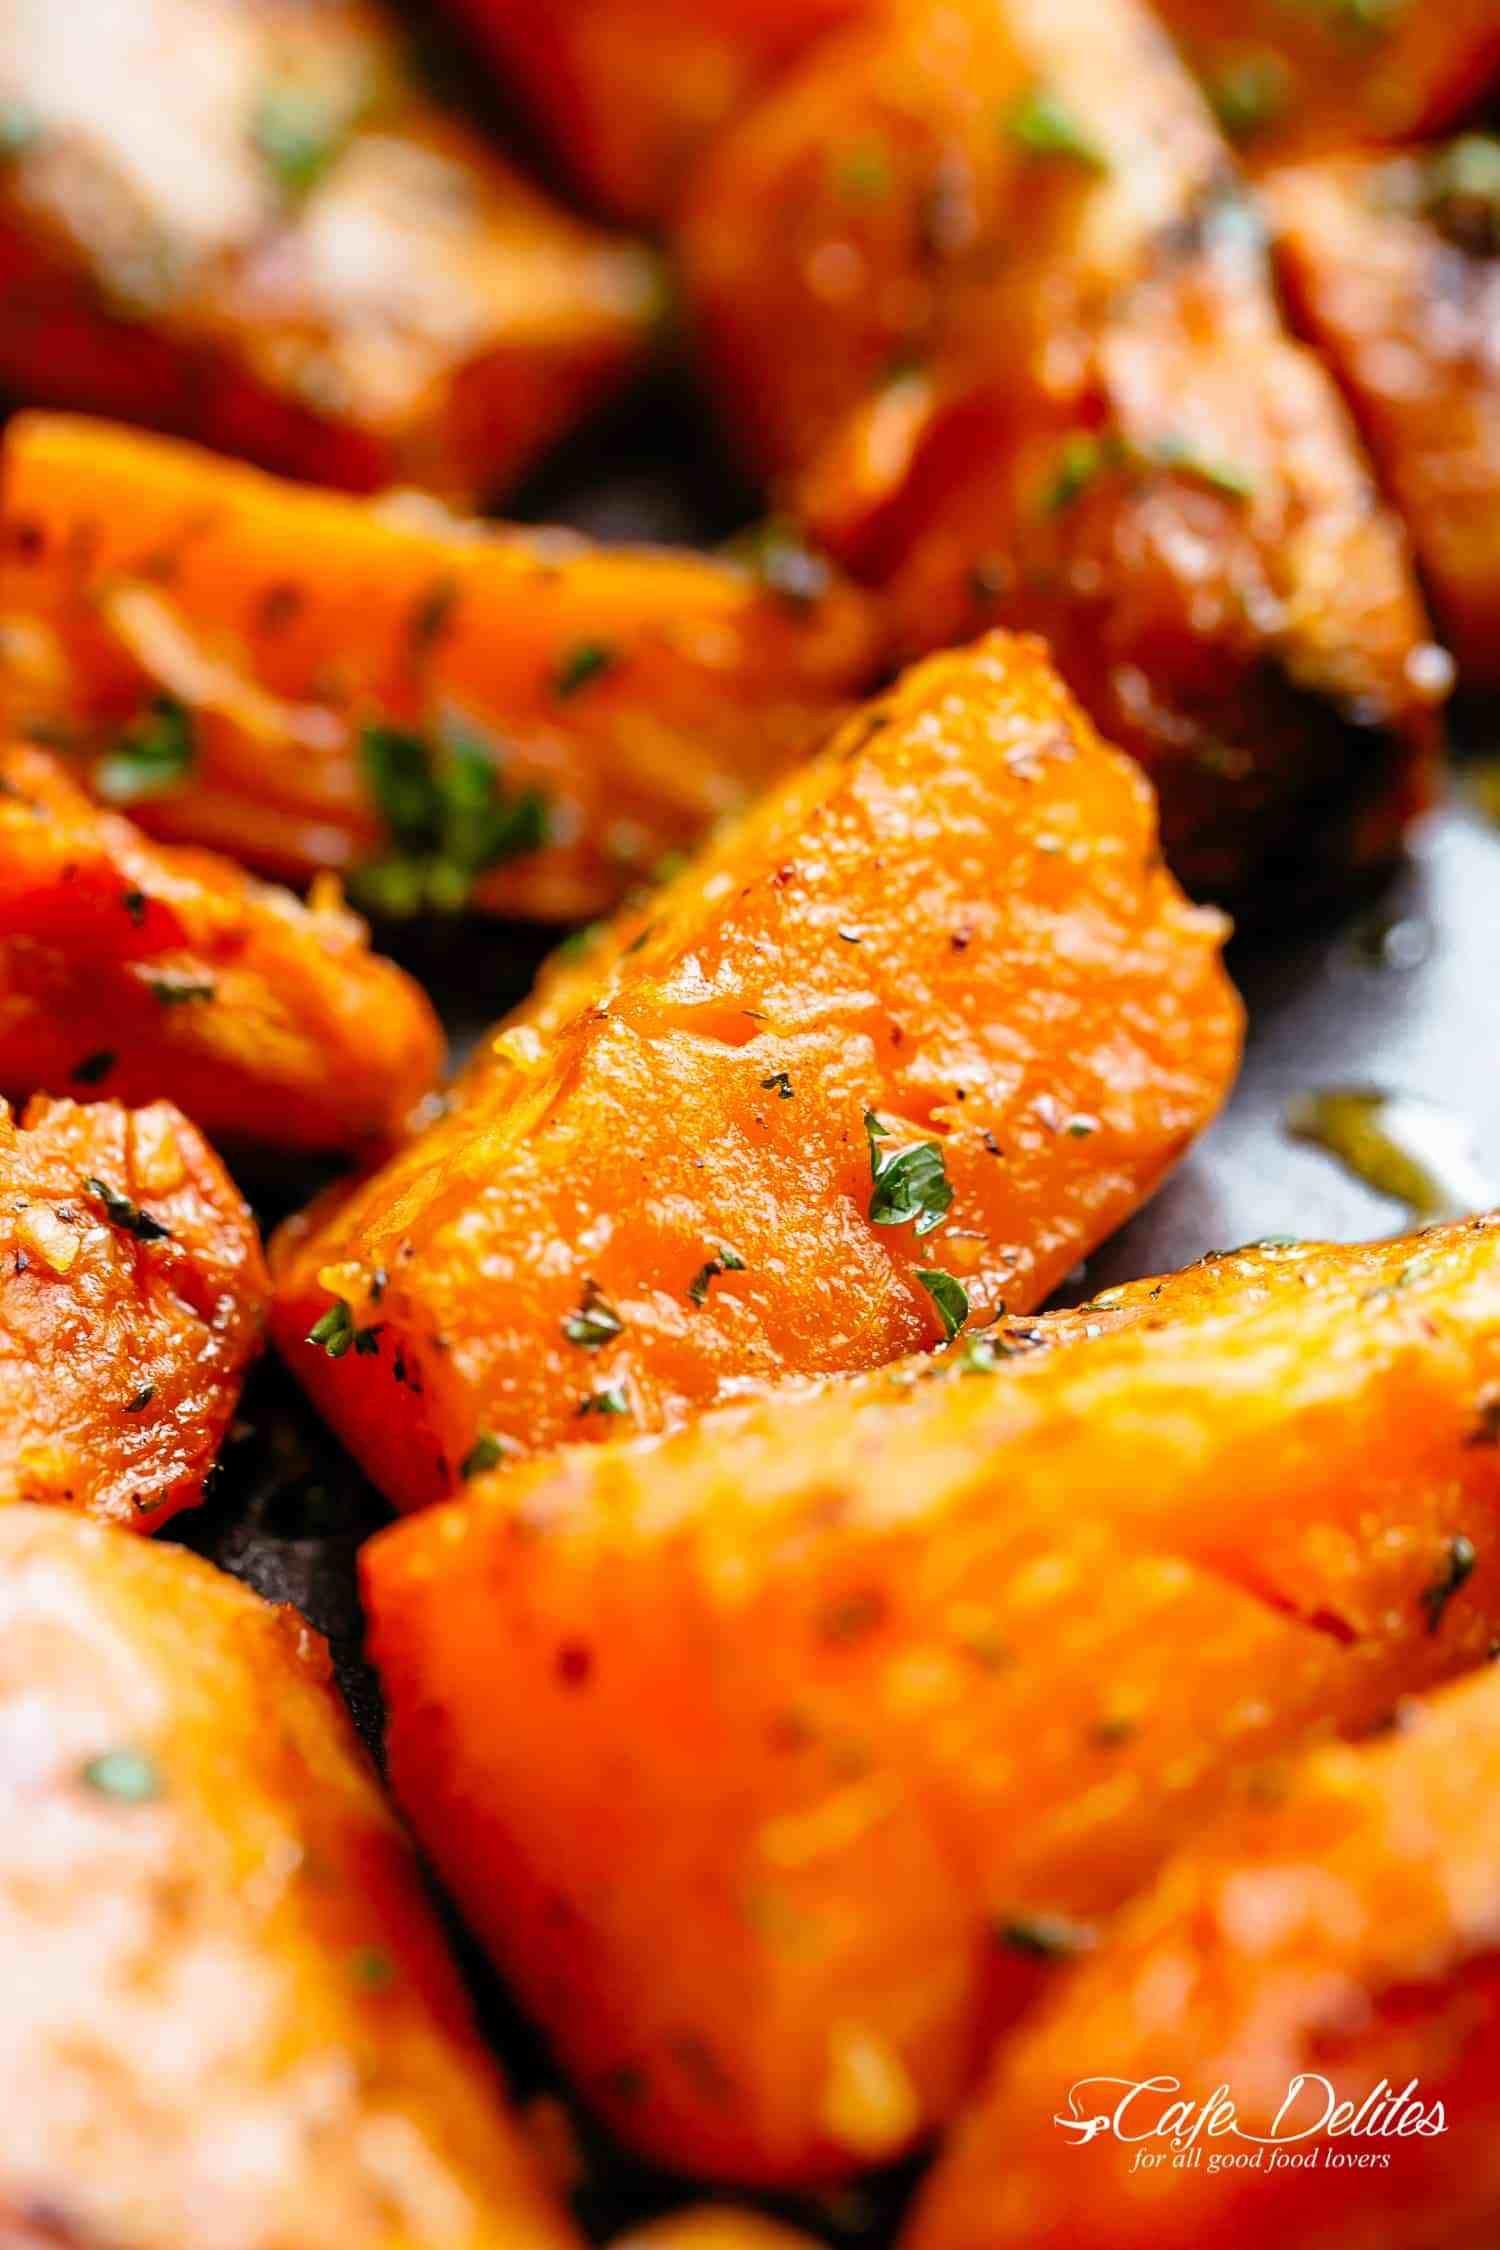 Easy Roasted Sweet Potatoes with irresistible caramelised